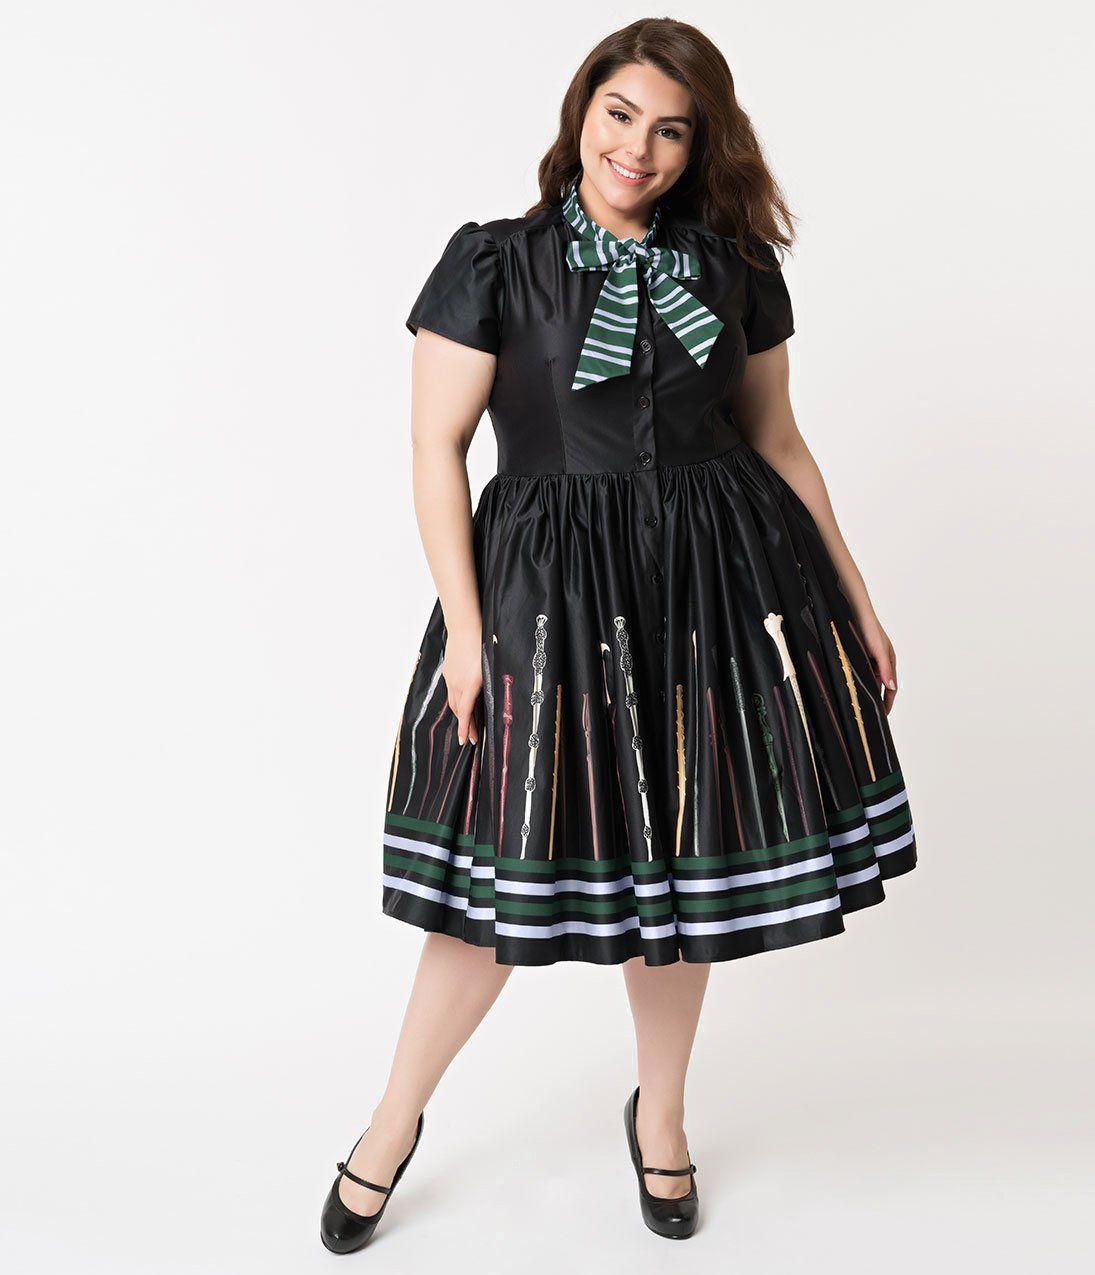 85ecfda4849 Plus Size 1950s Style Black Magic Wand Print Narcissa Swing Dress ...